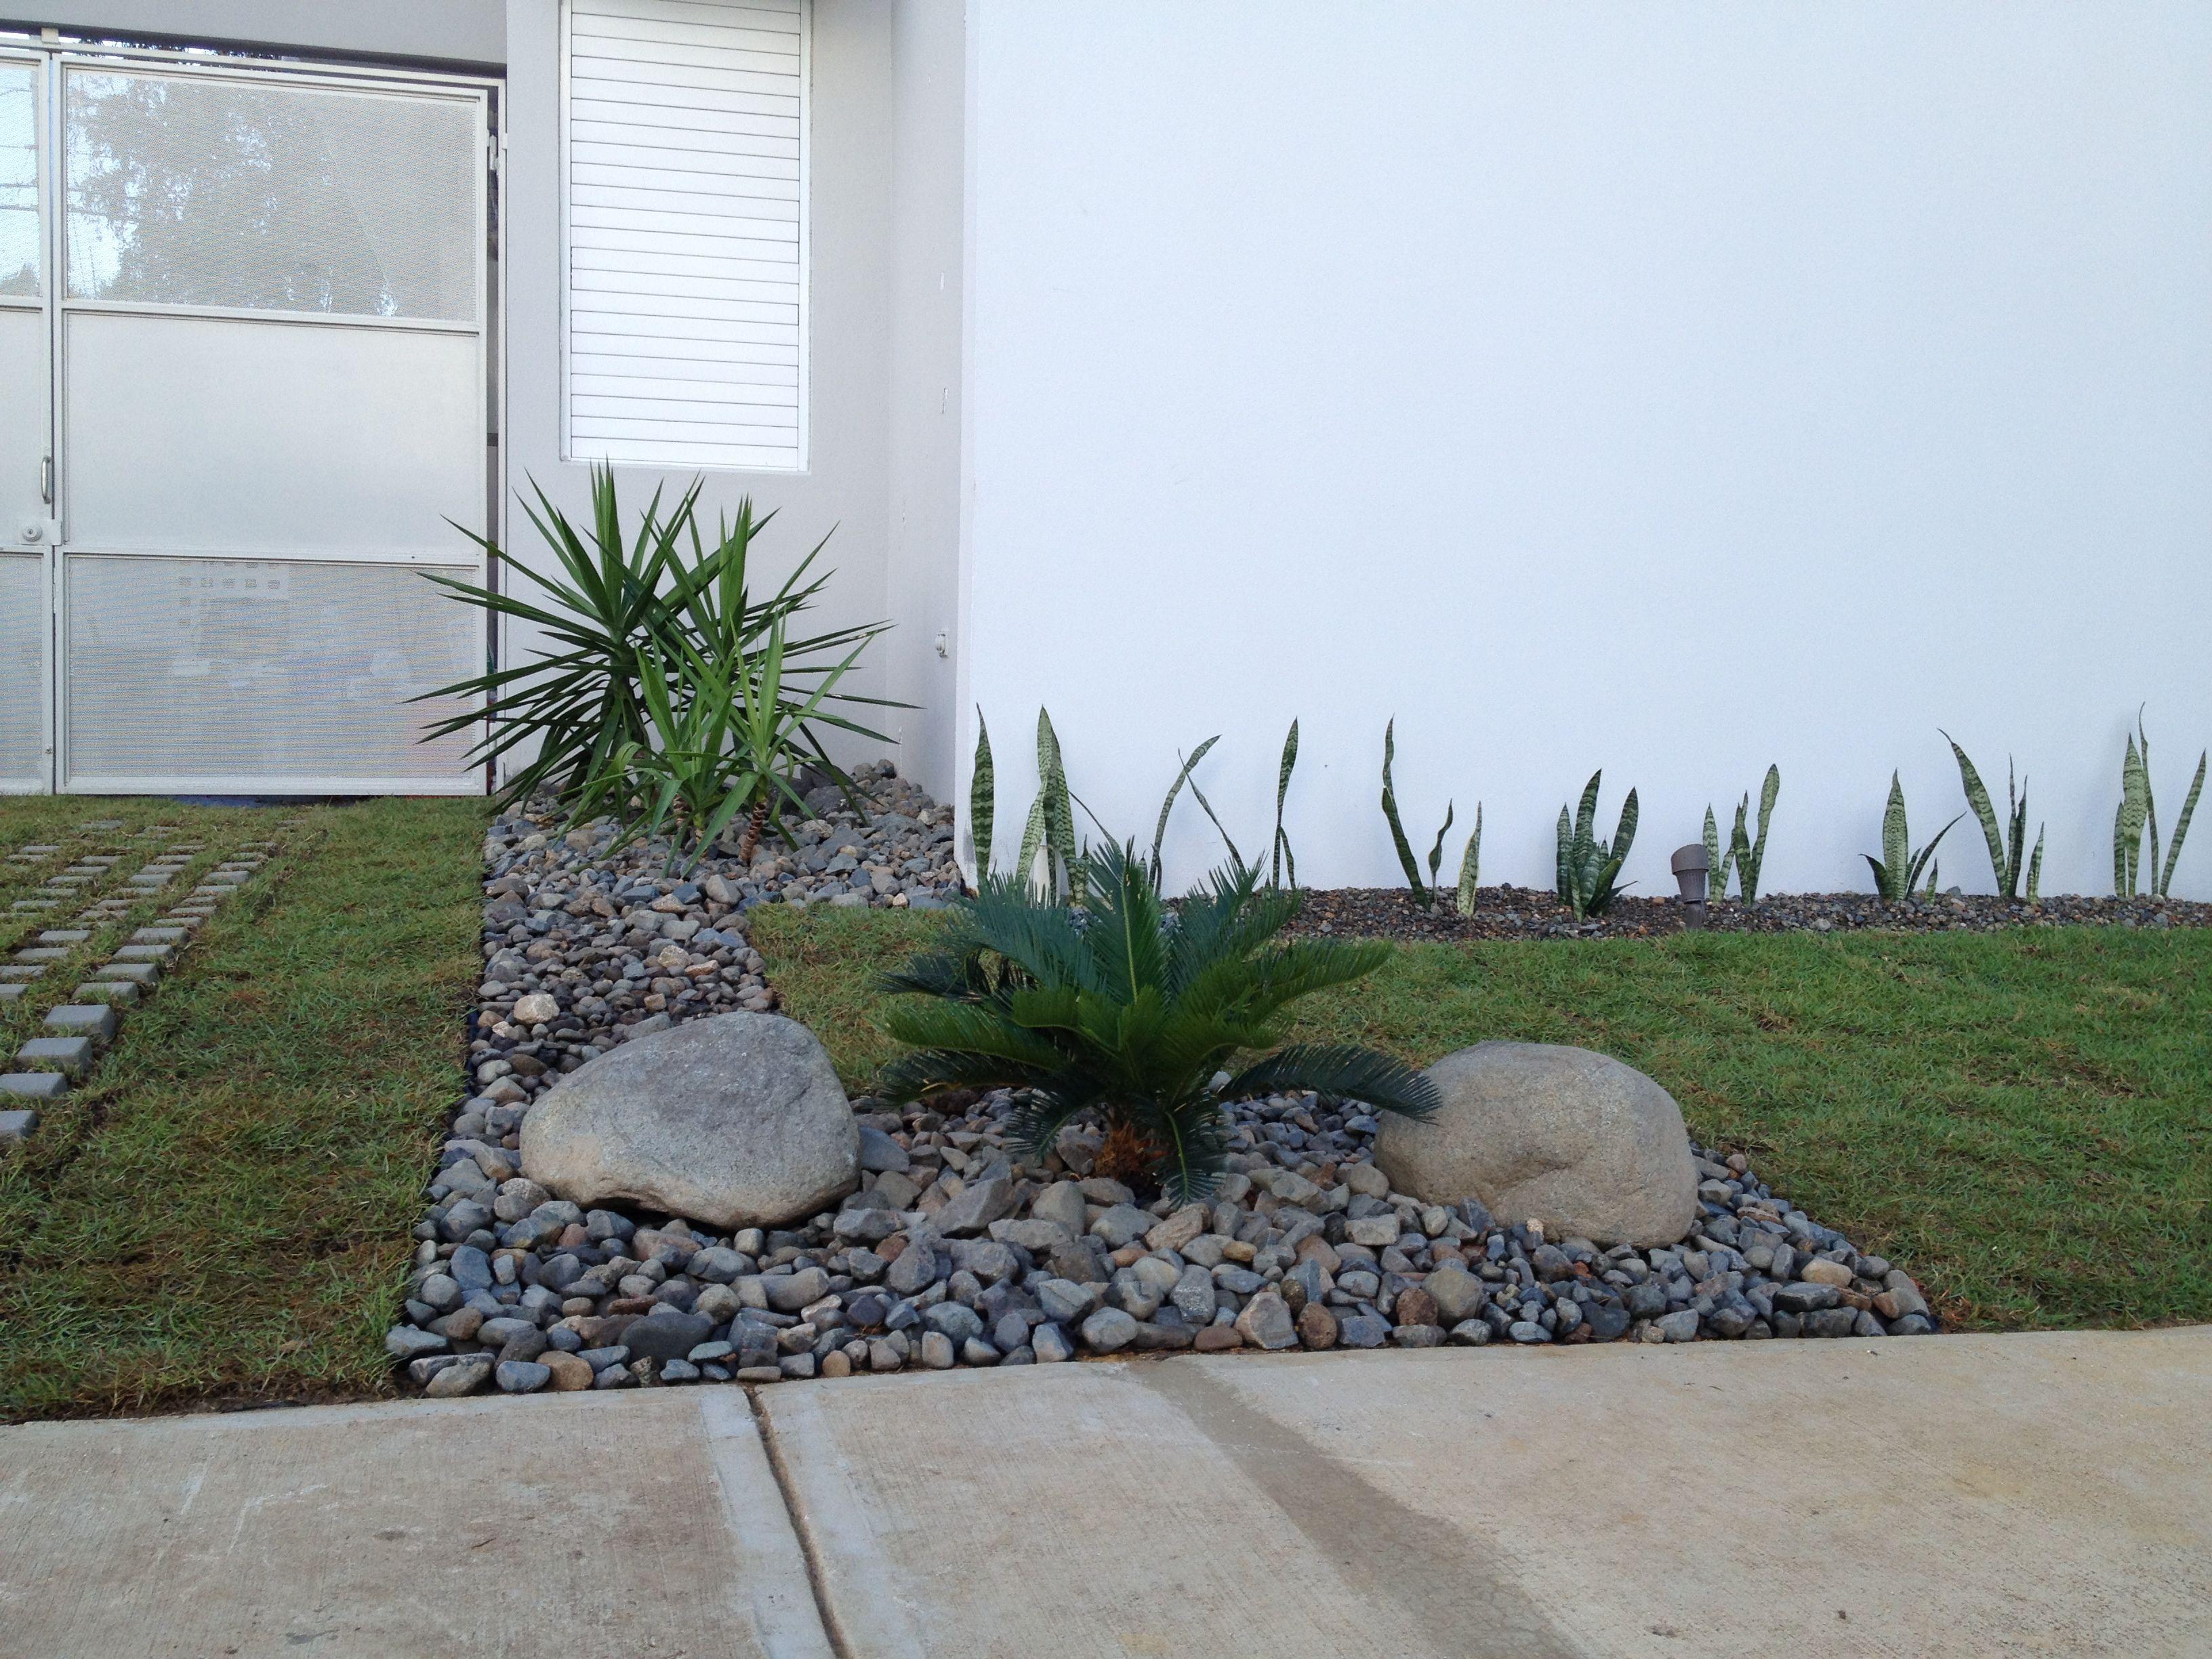 Jardin moderno balc n jard n porche pinterest for Jardin pequeno moderno